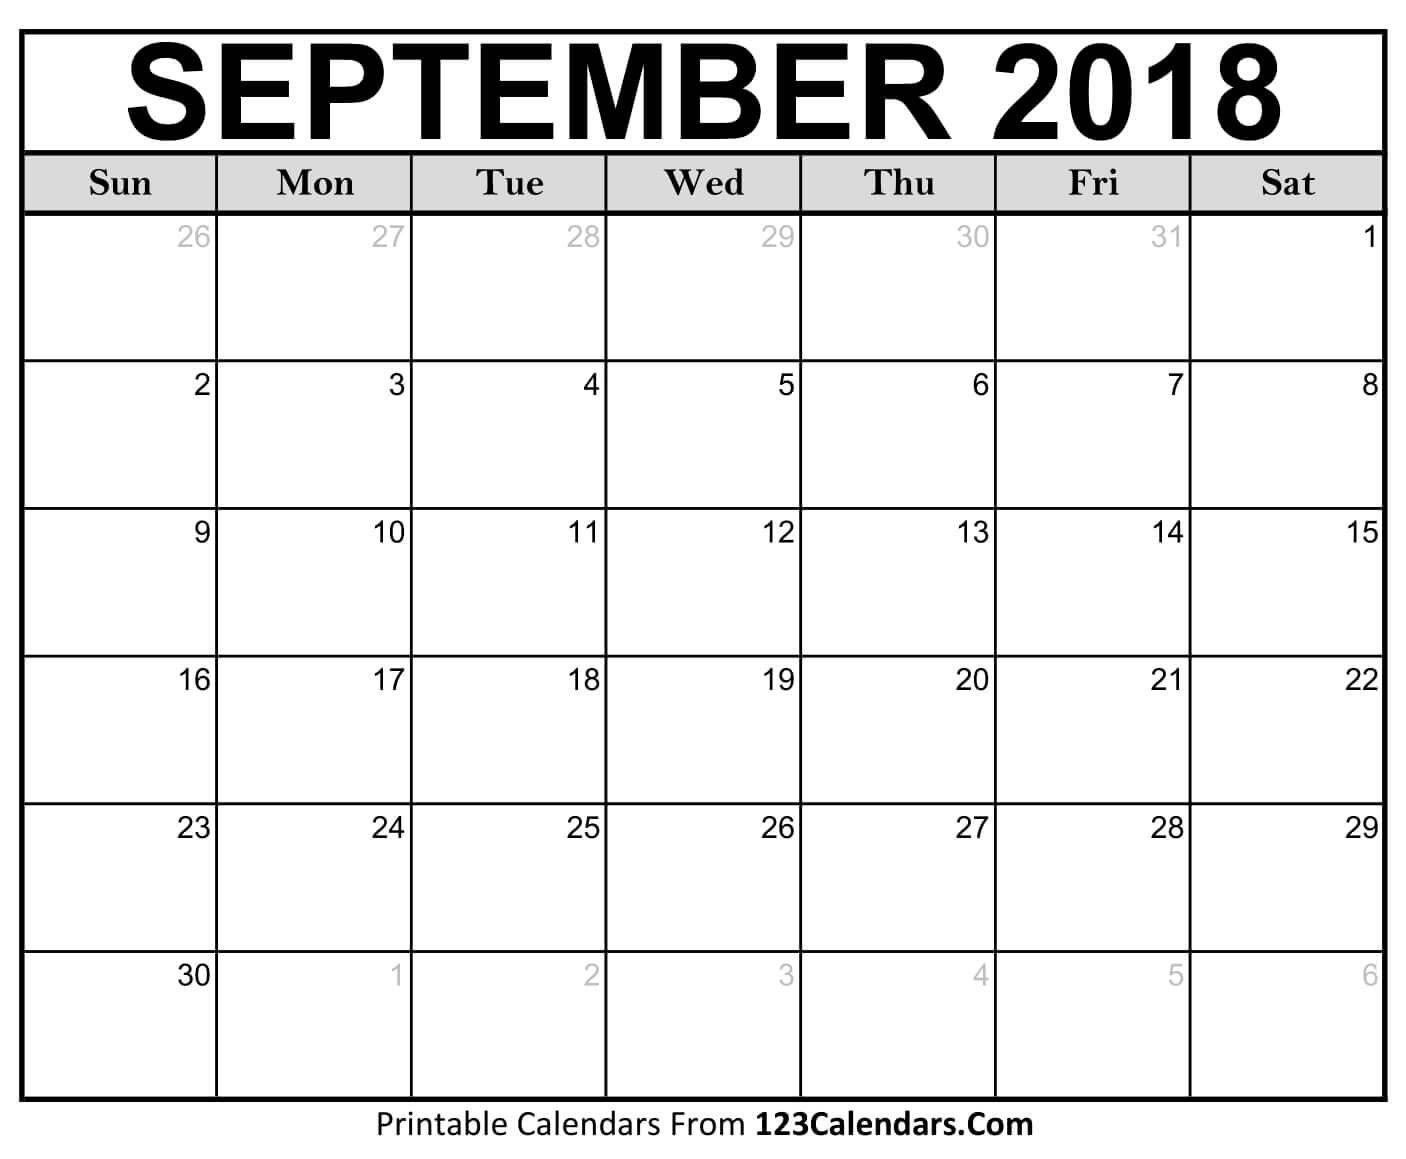 Printable September 2018 Calendar Templates – 123Calendars Calendar 2019 Sept